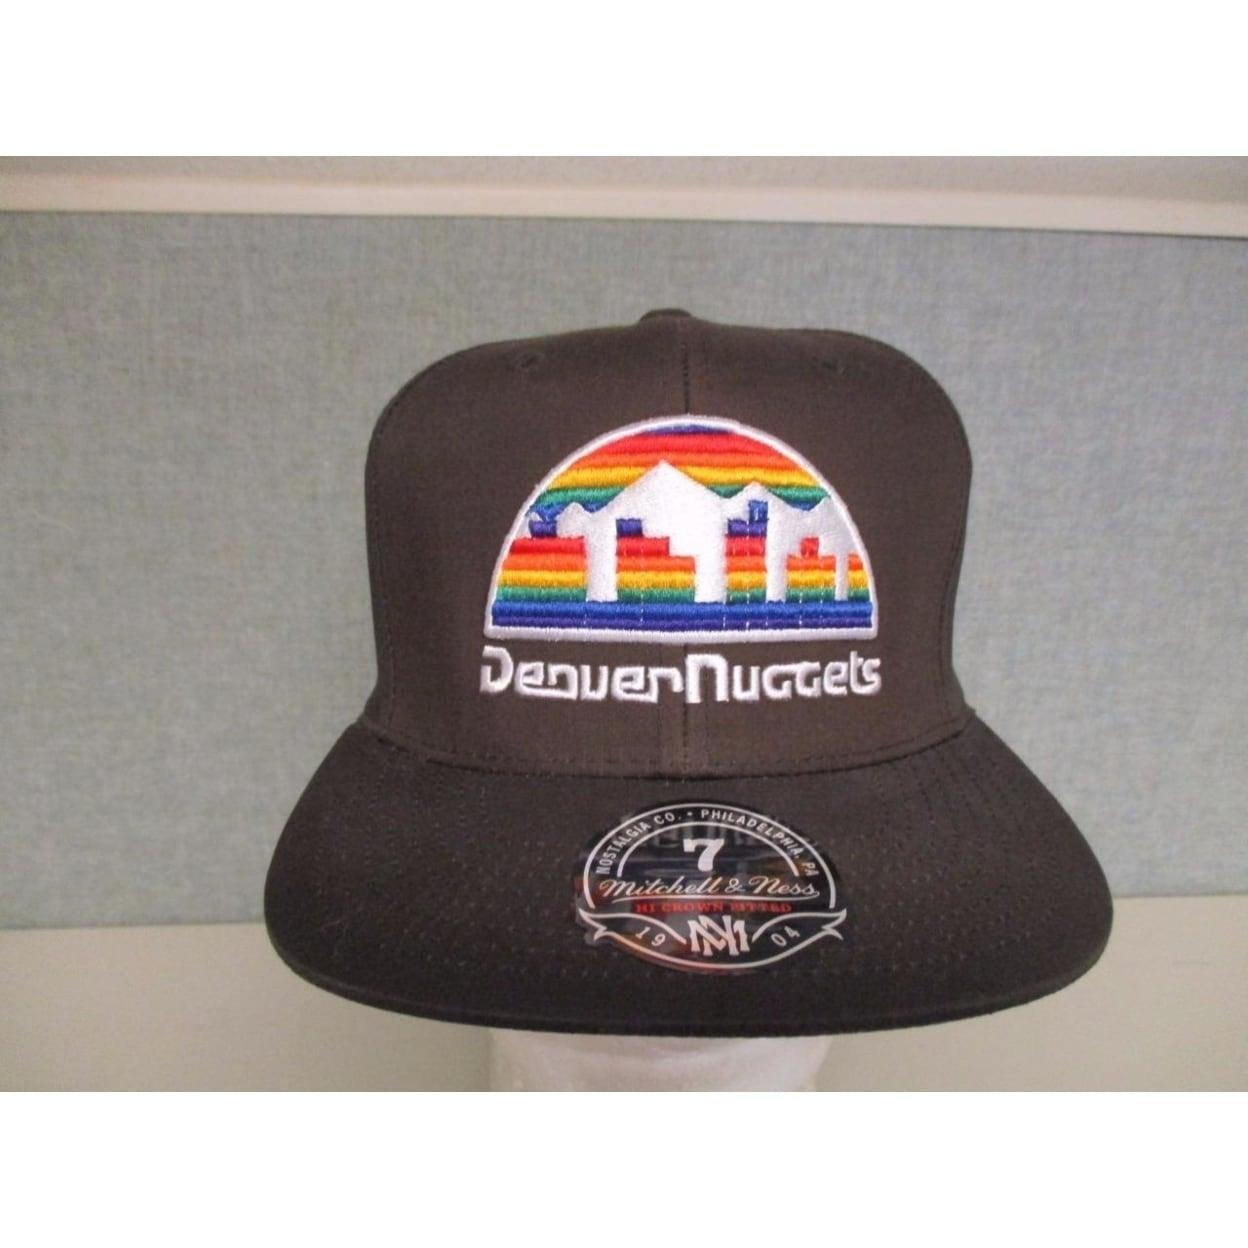 Denver Nuggets Mens Mitchell & Ness 7 1/-1/4-3/8-1/2 Flatbrim Brown/Camo Hat $32 (7 1/8)